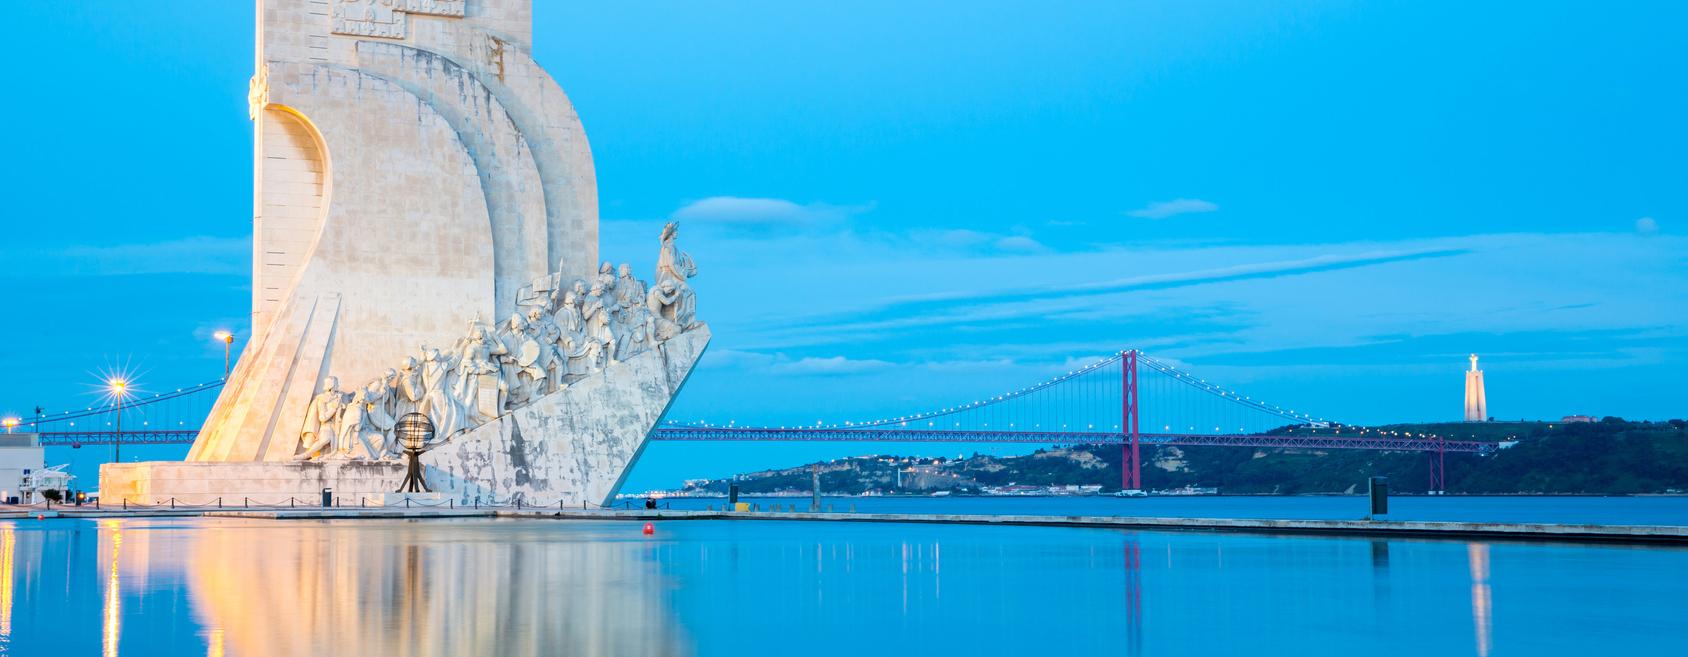 Portugal_Lisbon_travel_holidays_vacations_Lisboa_Belem_Tejo